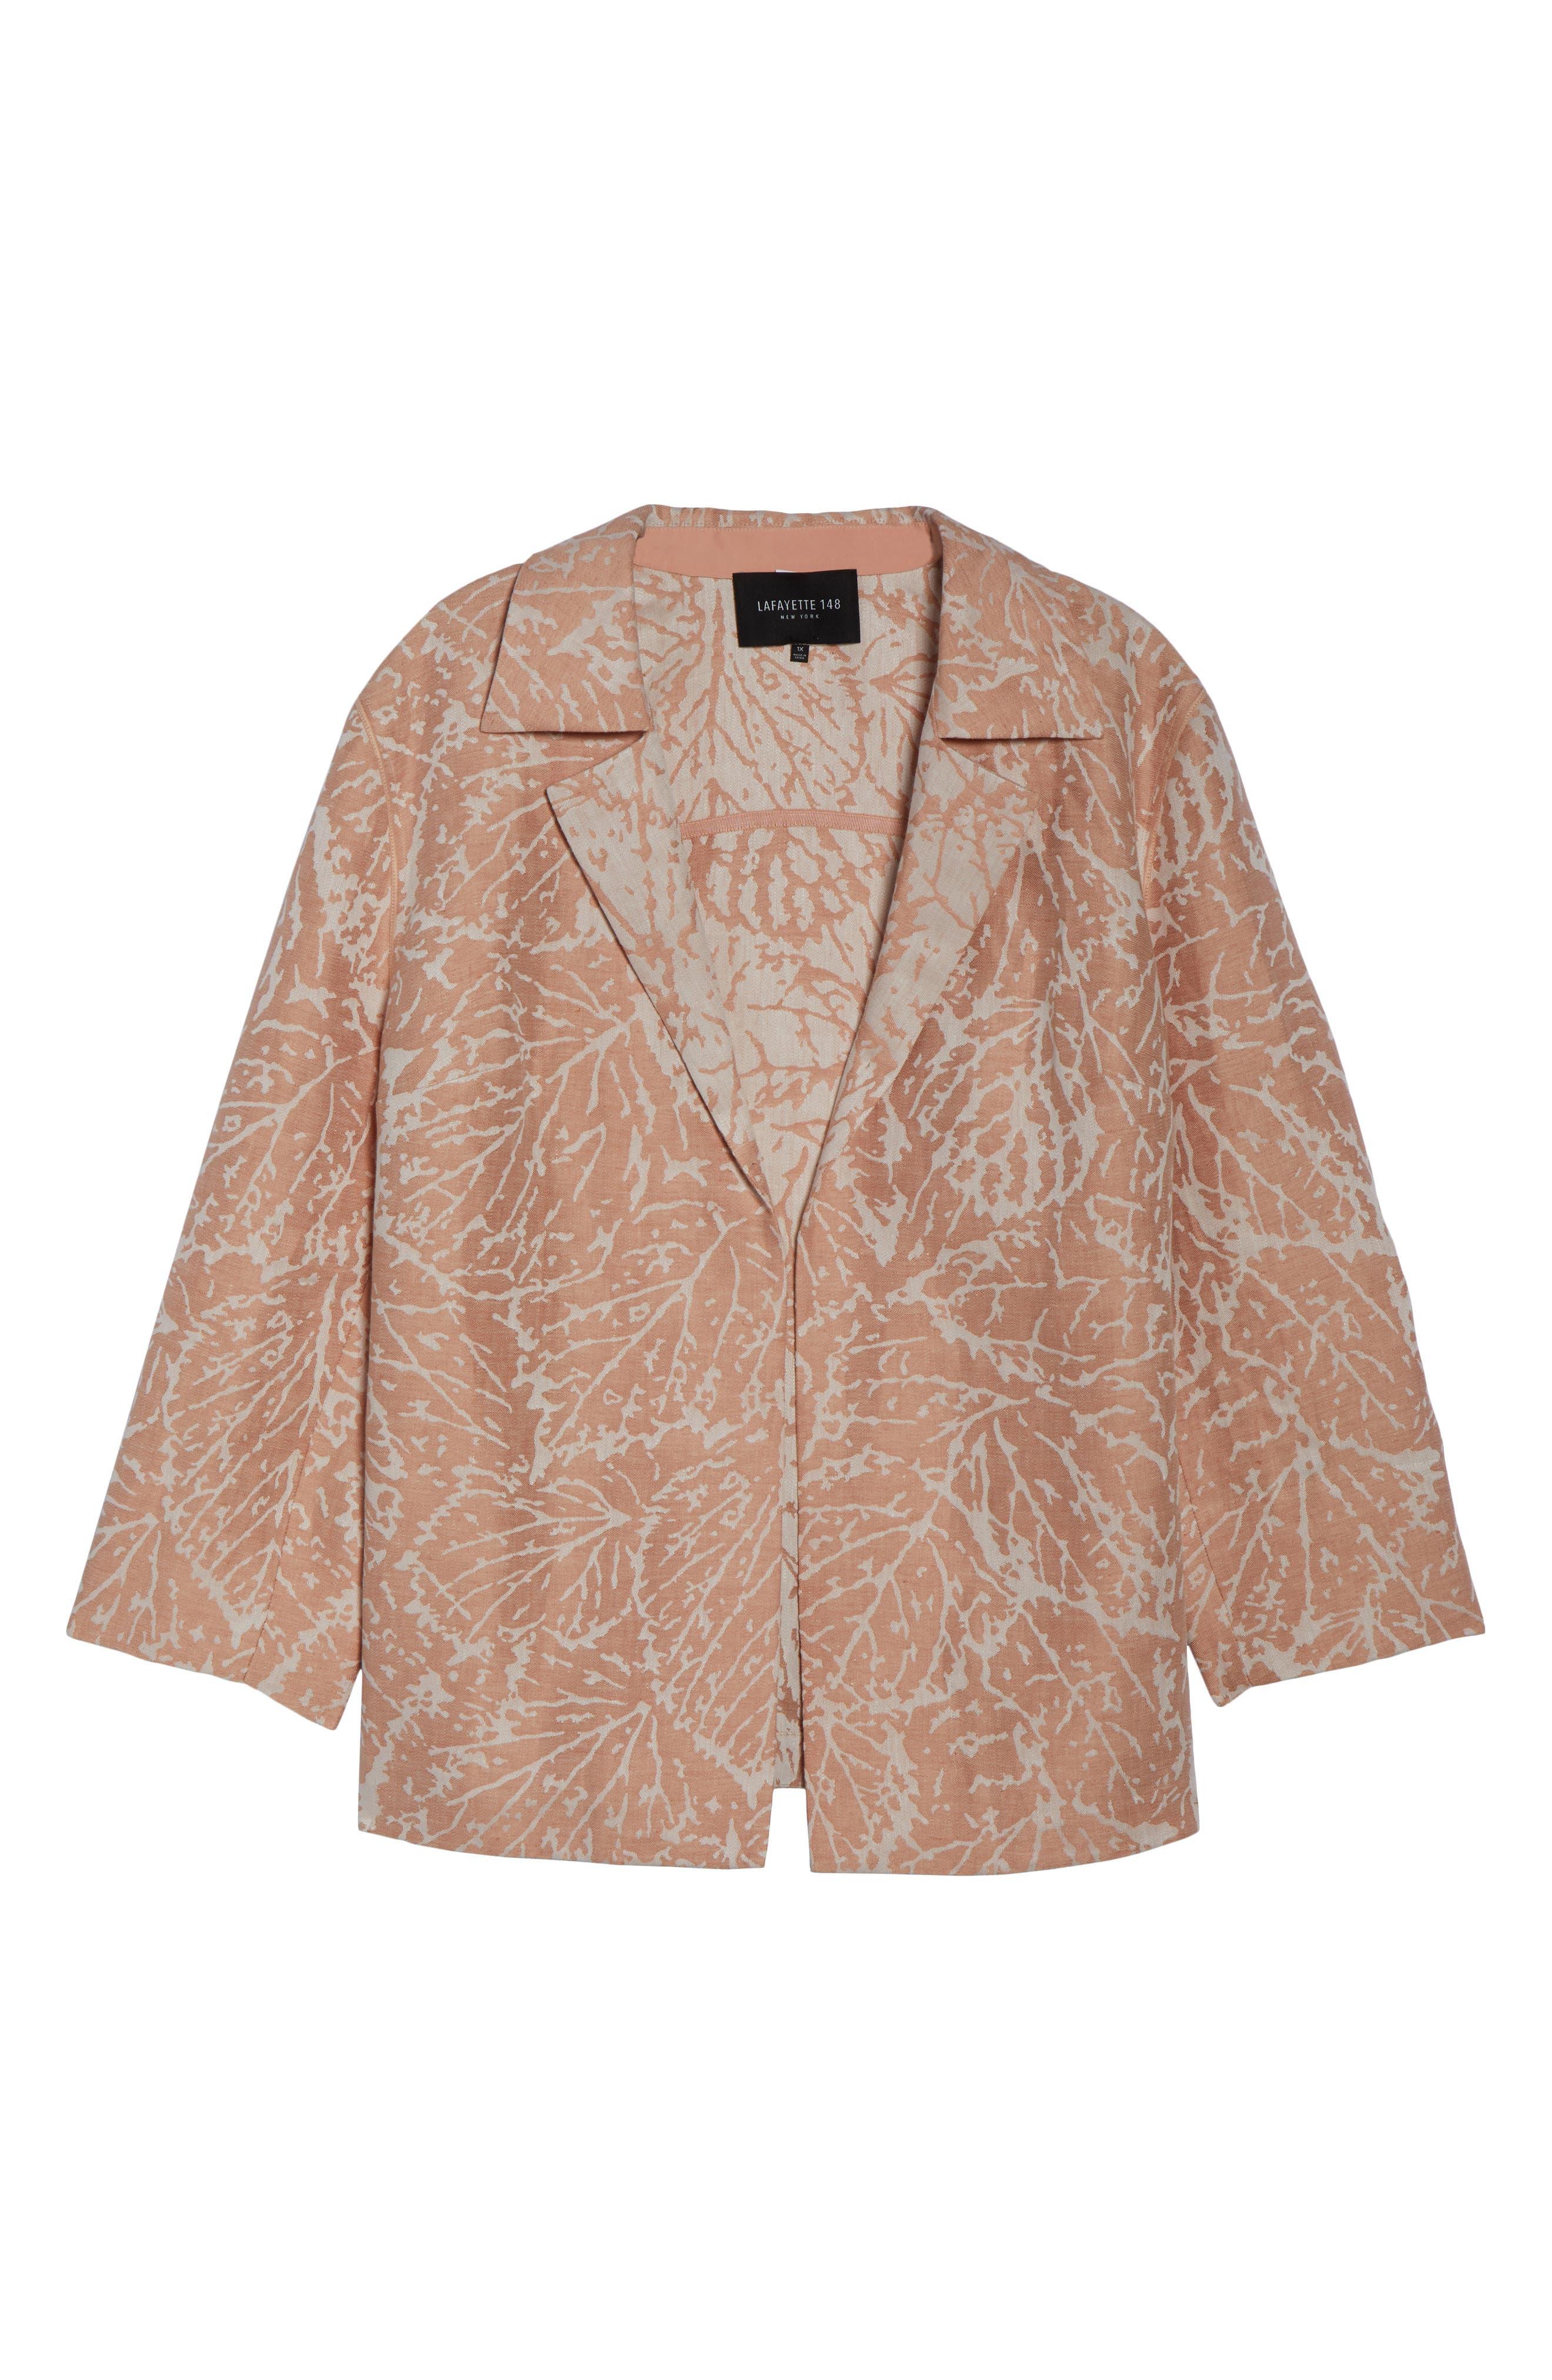 Phillipe Linen Jacket,                             Alternate thumbnail 6, color,                             Rose Quartz Multi